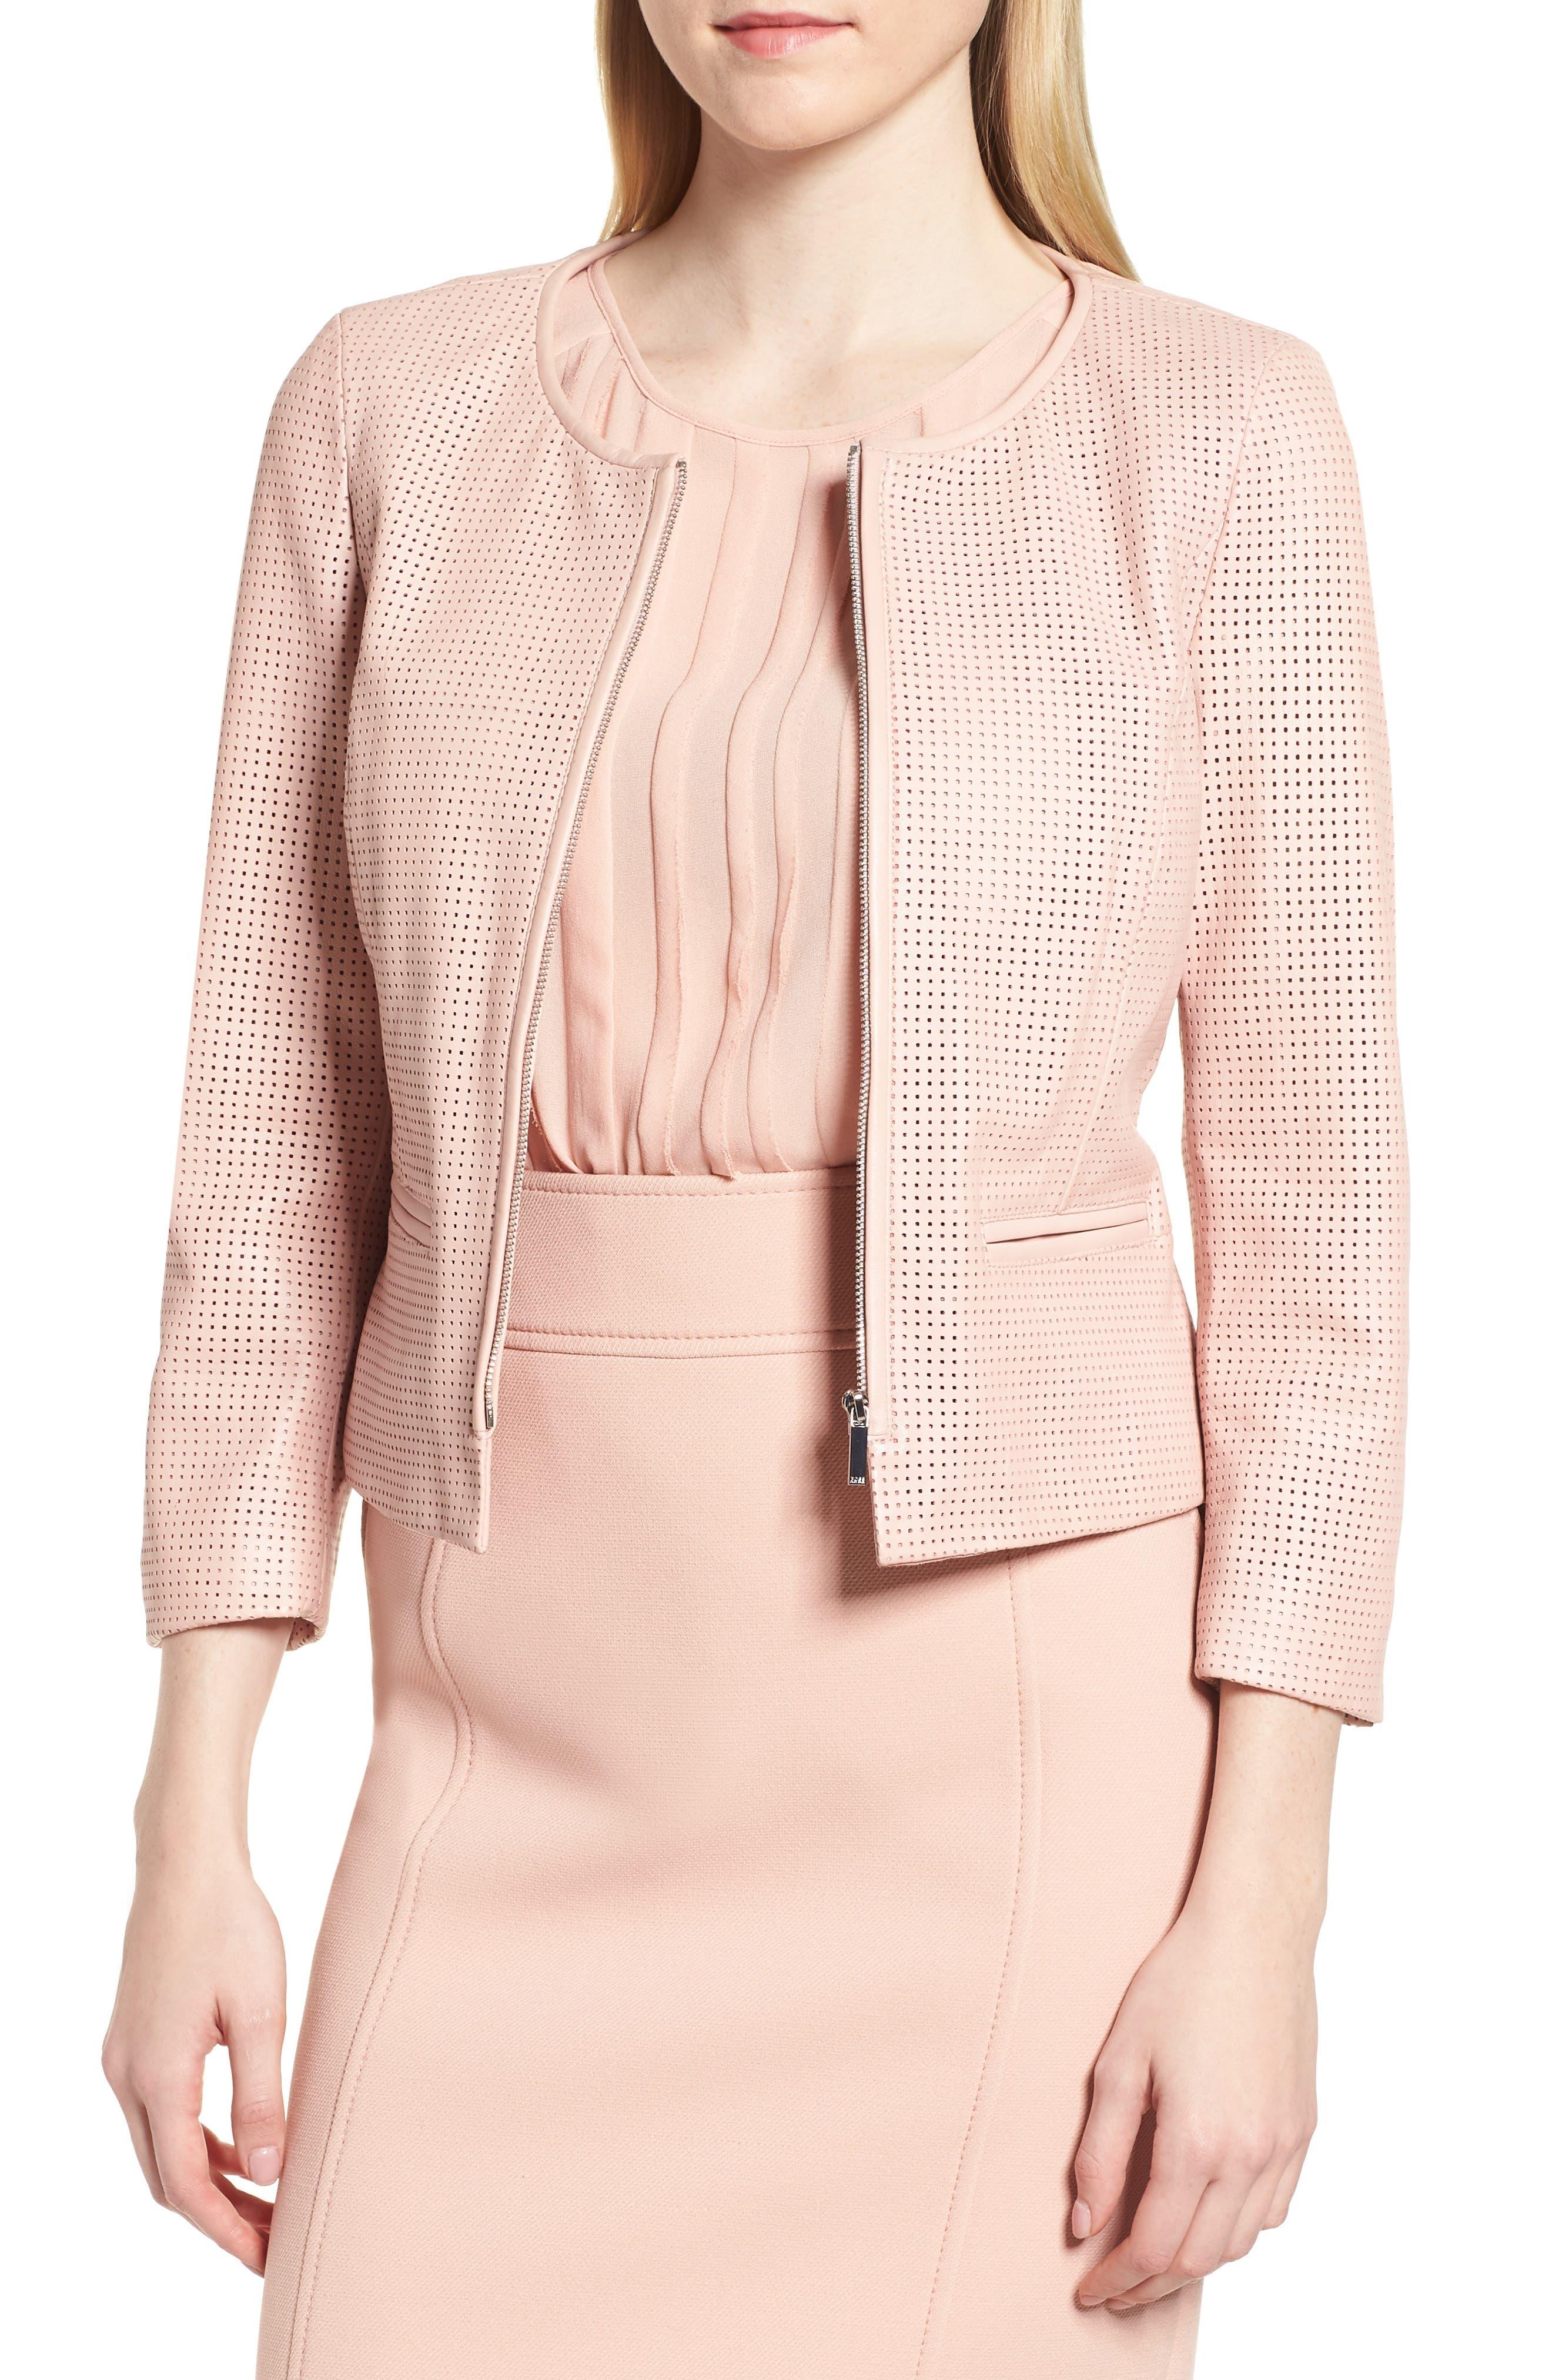 Sallotina Perforated Leather Jacket,                         Main,                         color, Blush